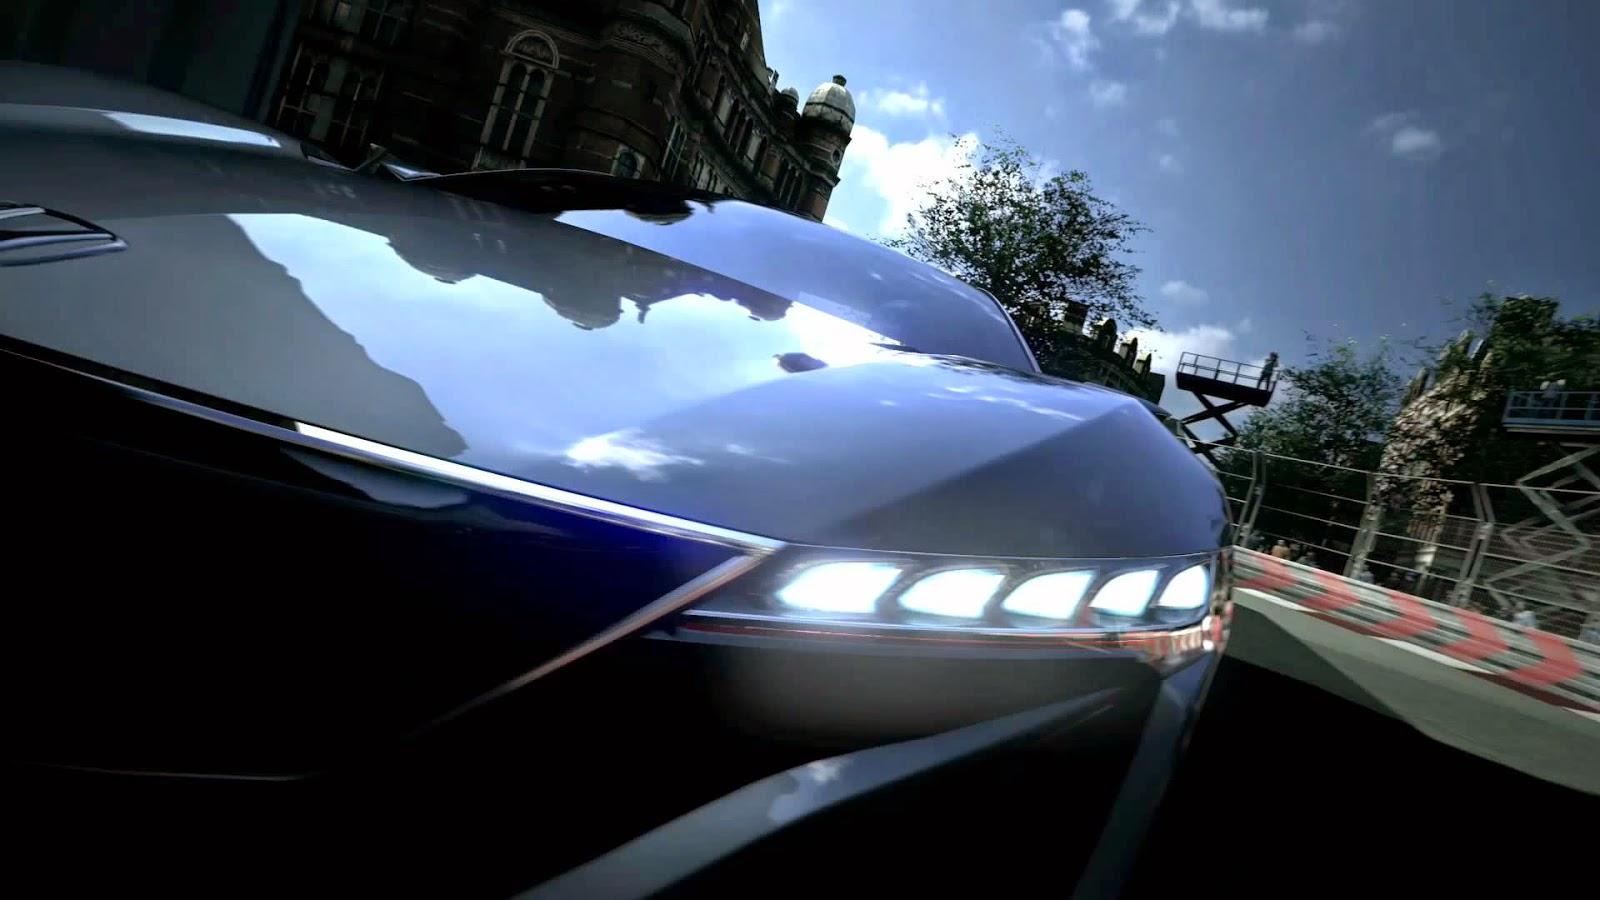 awesome, stunning, concept car, 2014, honda, nsx concept, concept car, price, release date,v6 engine, interior, exterior, geneva motor show